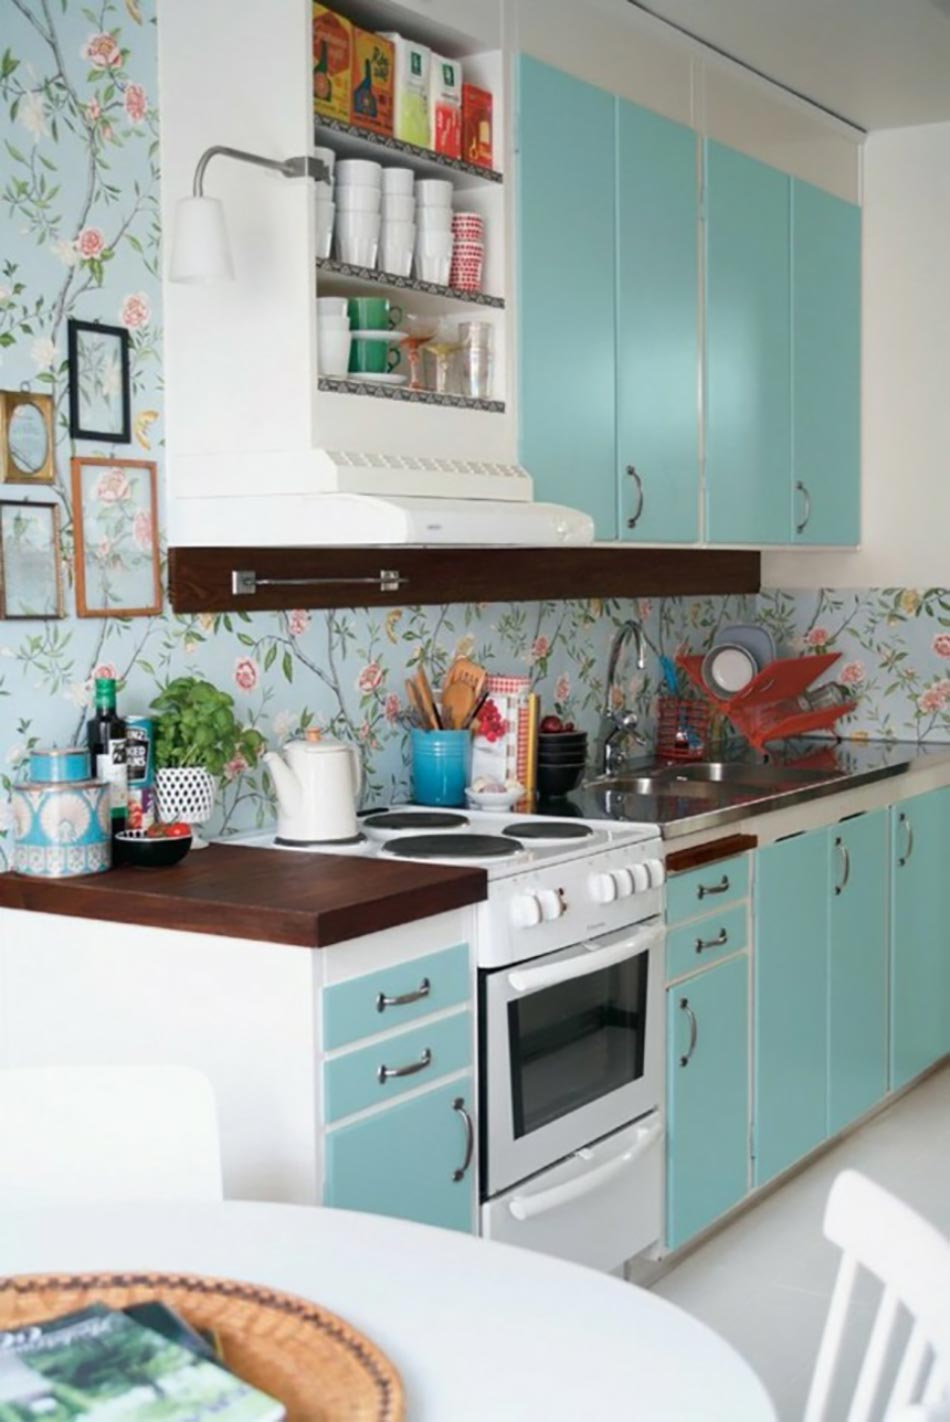 decoration cuisine turquoise. Black Bedroom Furniture Sets. Home Design Ideas